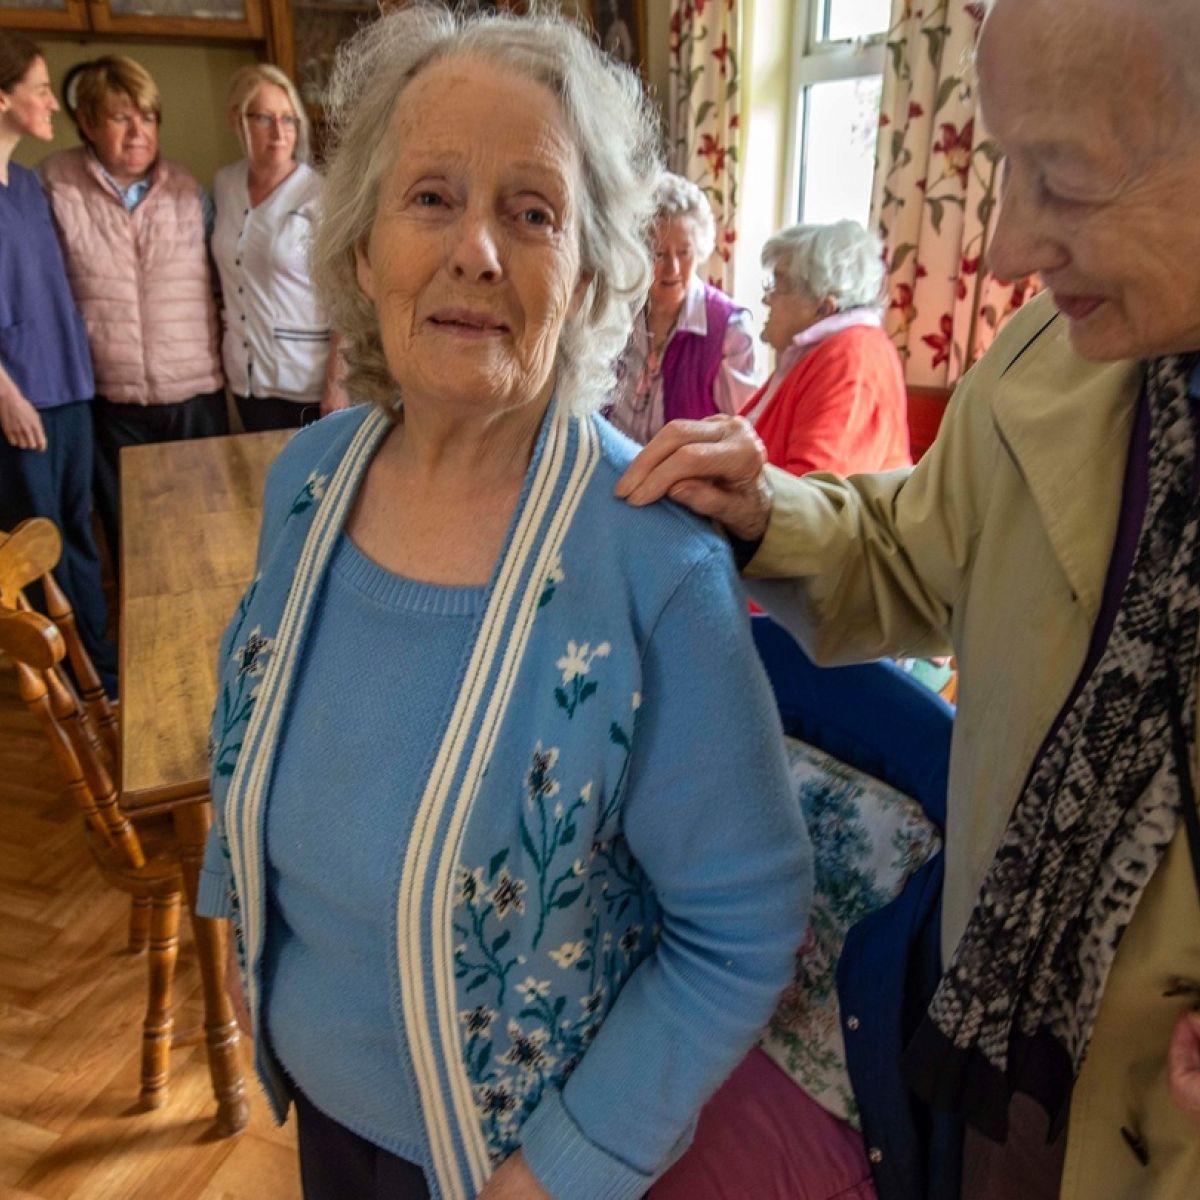 Gardai seek public help in locating elderly Cork - Cork Beo